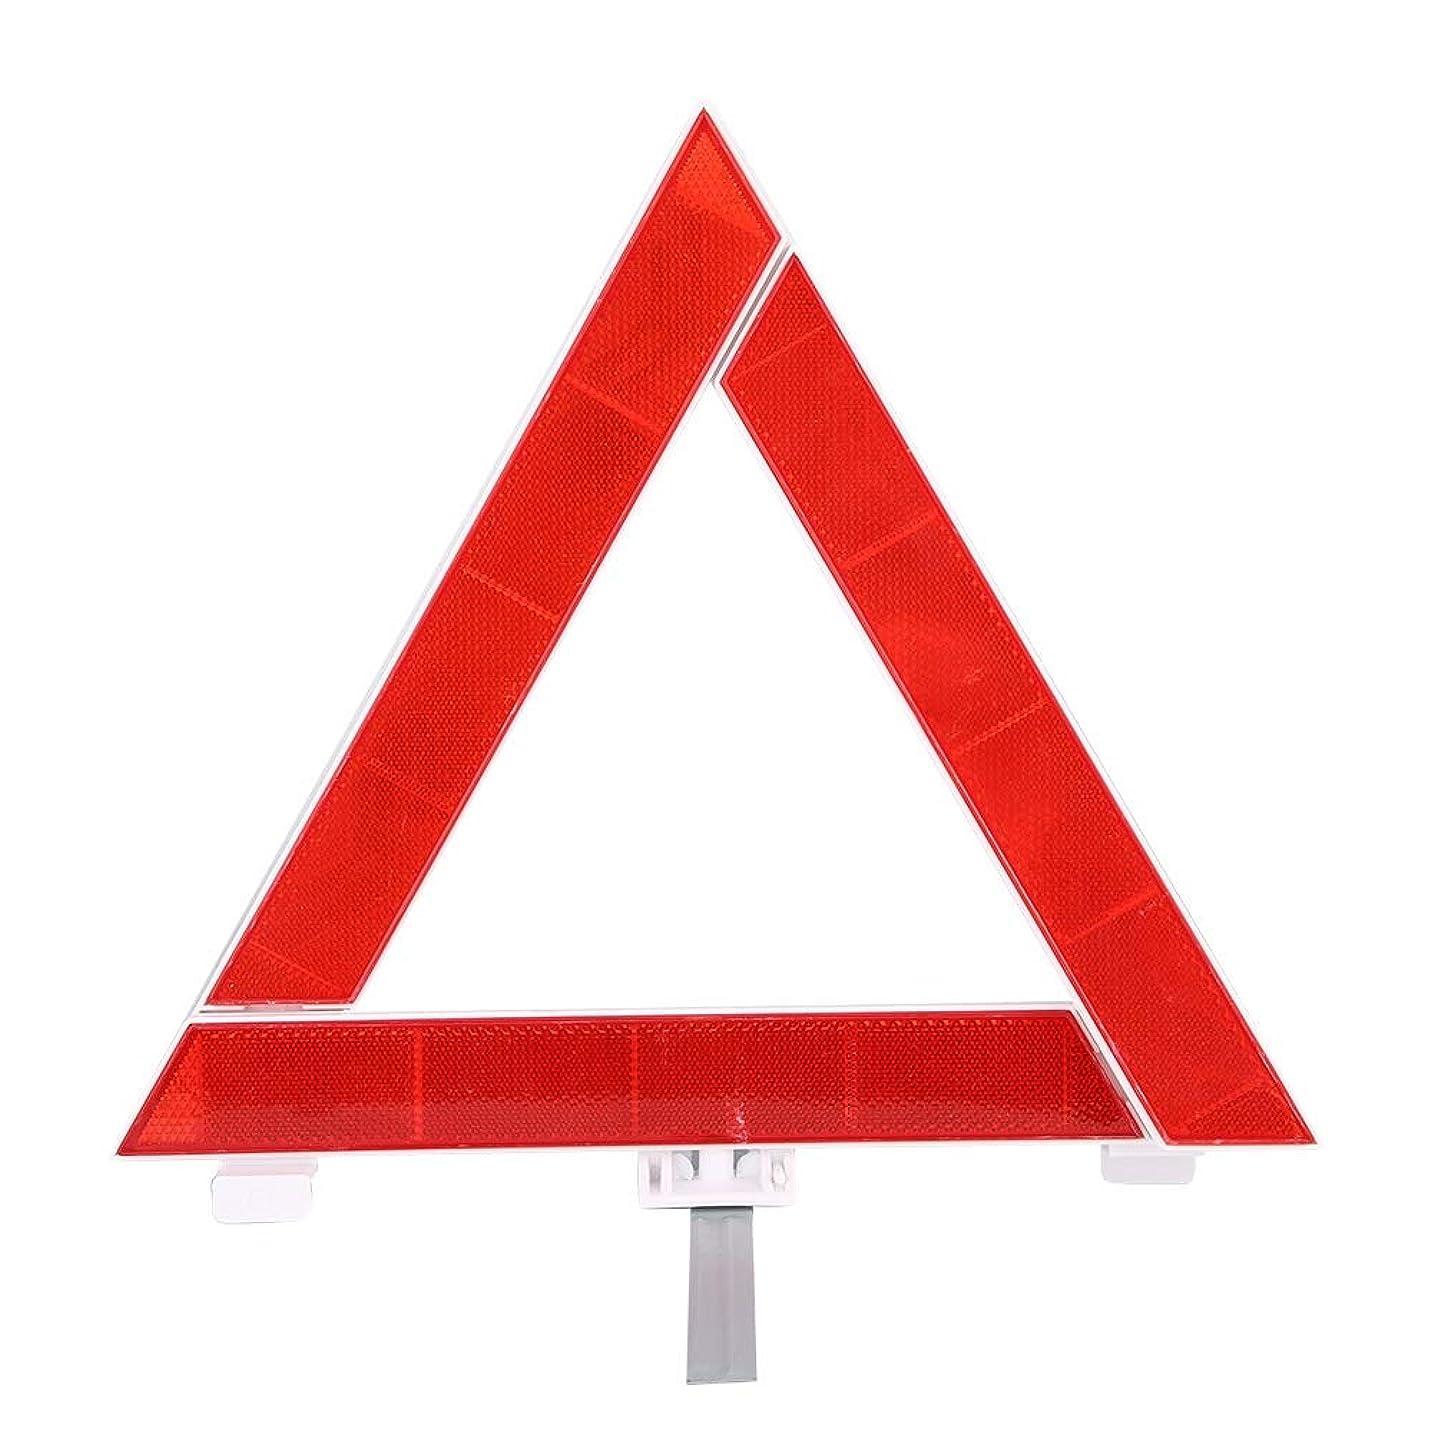 拷問知覚できる残るQiilu 車用 三角停止板 反射三角形 三角停止表示板 折りたたみ式 反射 緊急 安全 緊急停止 緊急対応用品 昼夜兼用 高速 一般道路